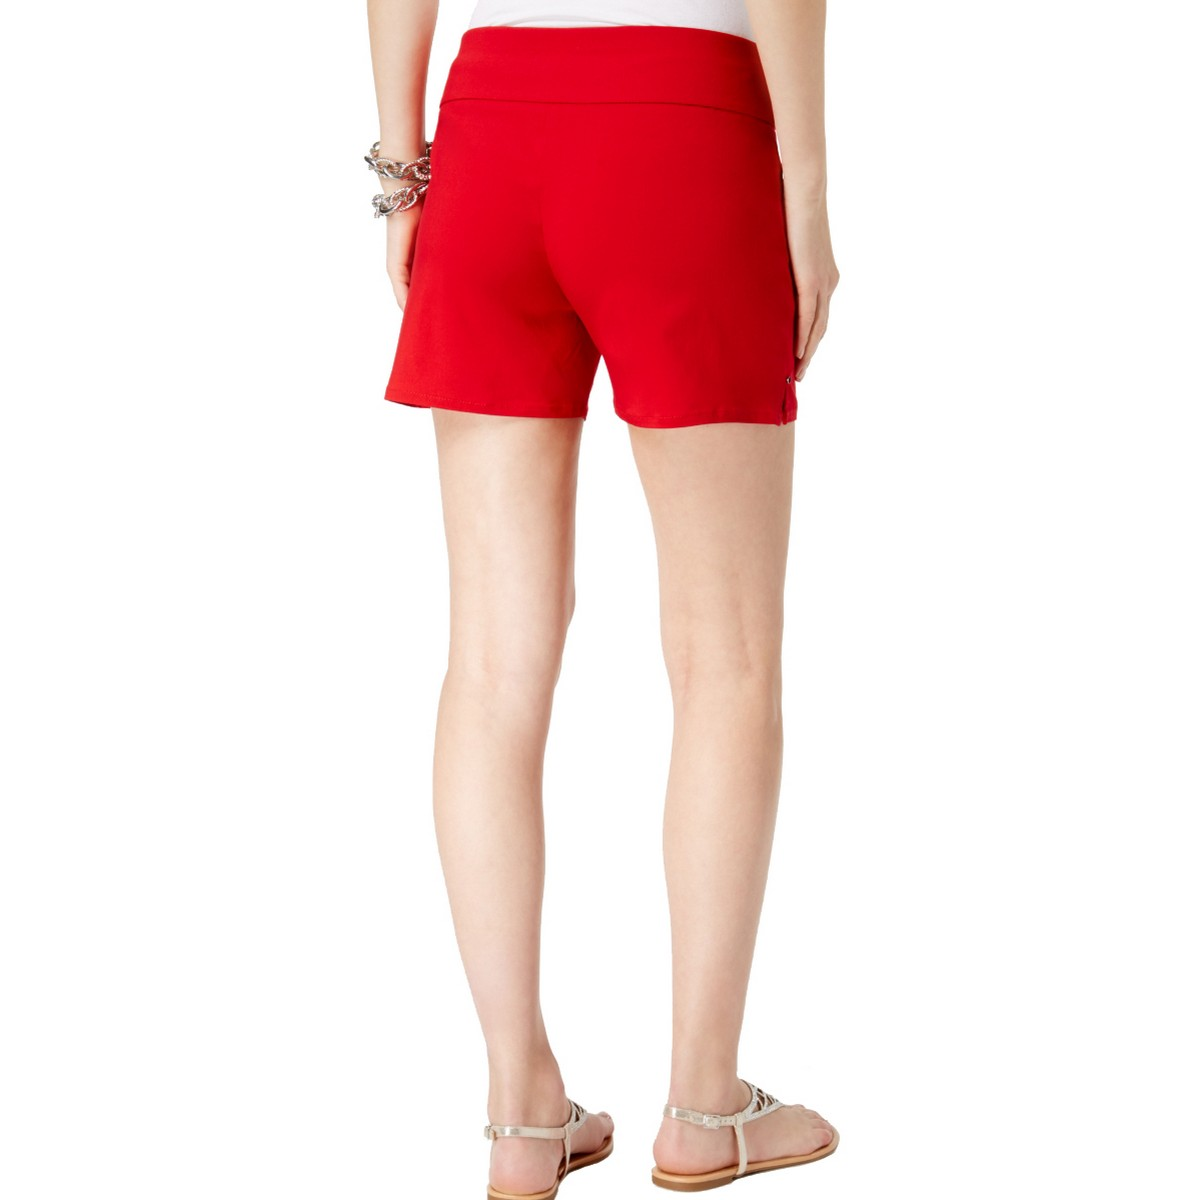 INC-NEW-Women-039-s-Pull-On-Curvy-Fit-Front-Pockets-Khaki-Chino-Shorts-TEDO thumbnail 8